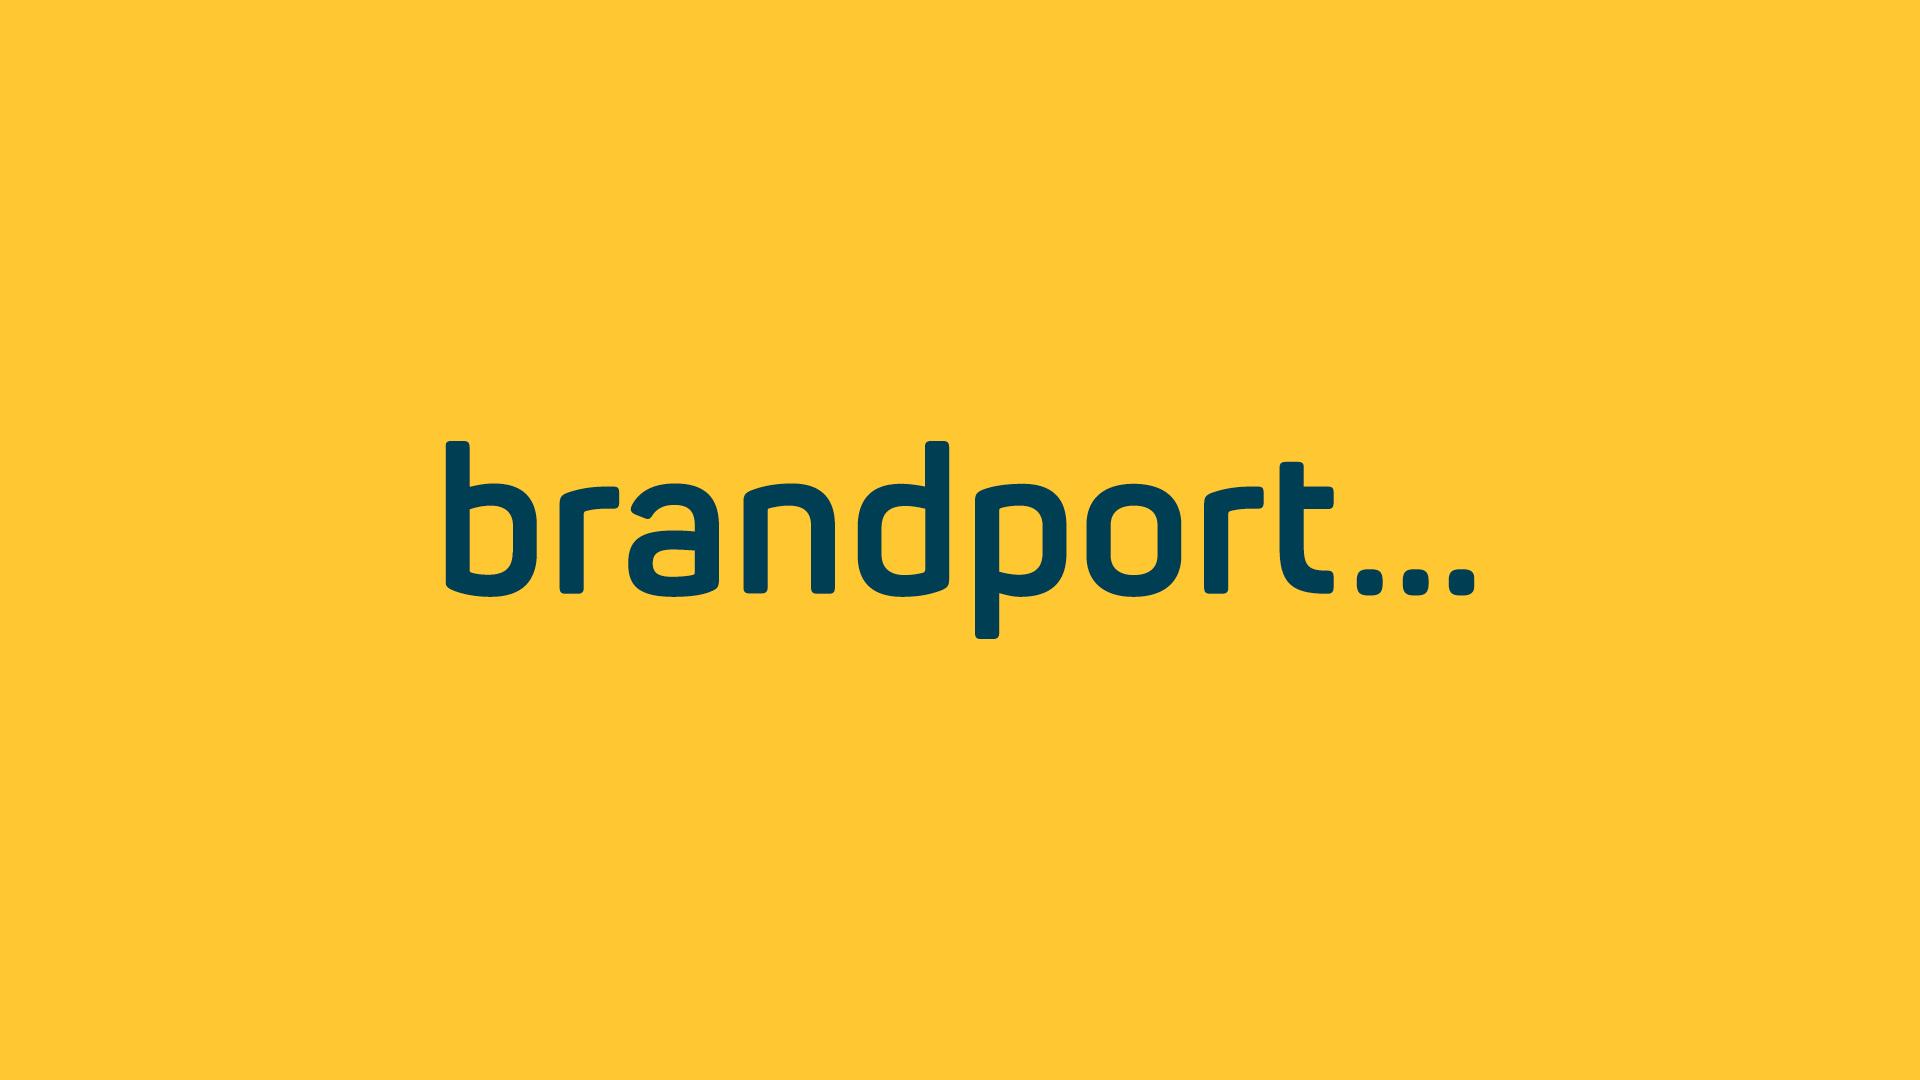 brandport…